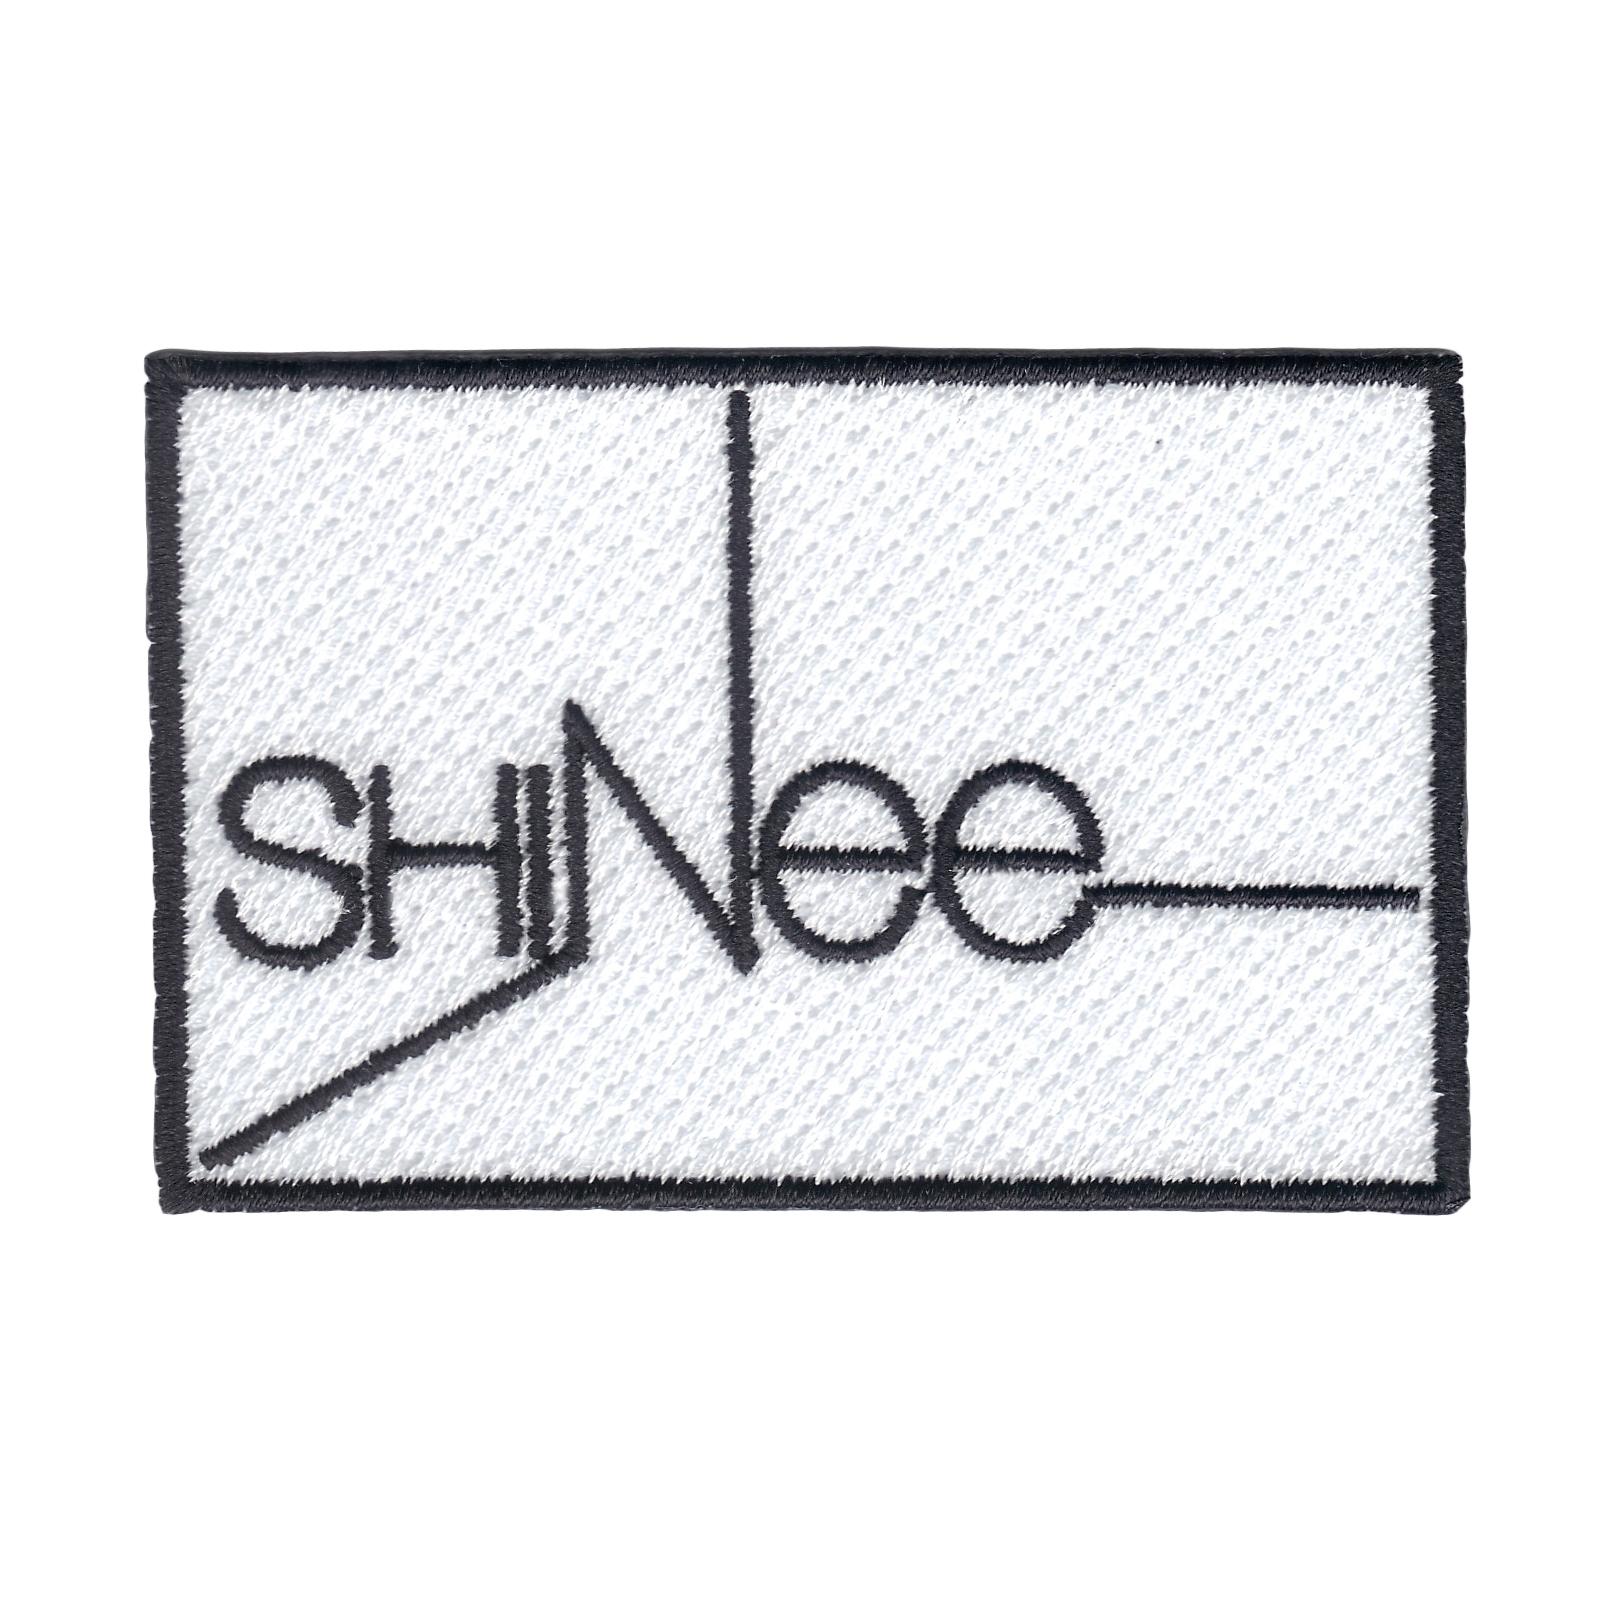 K-Pop Group Shinee Logo Iron On Patch